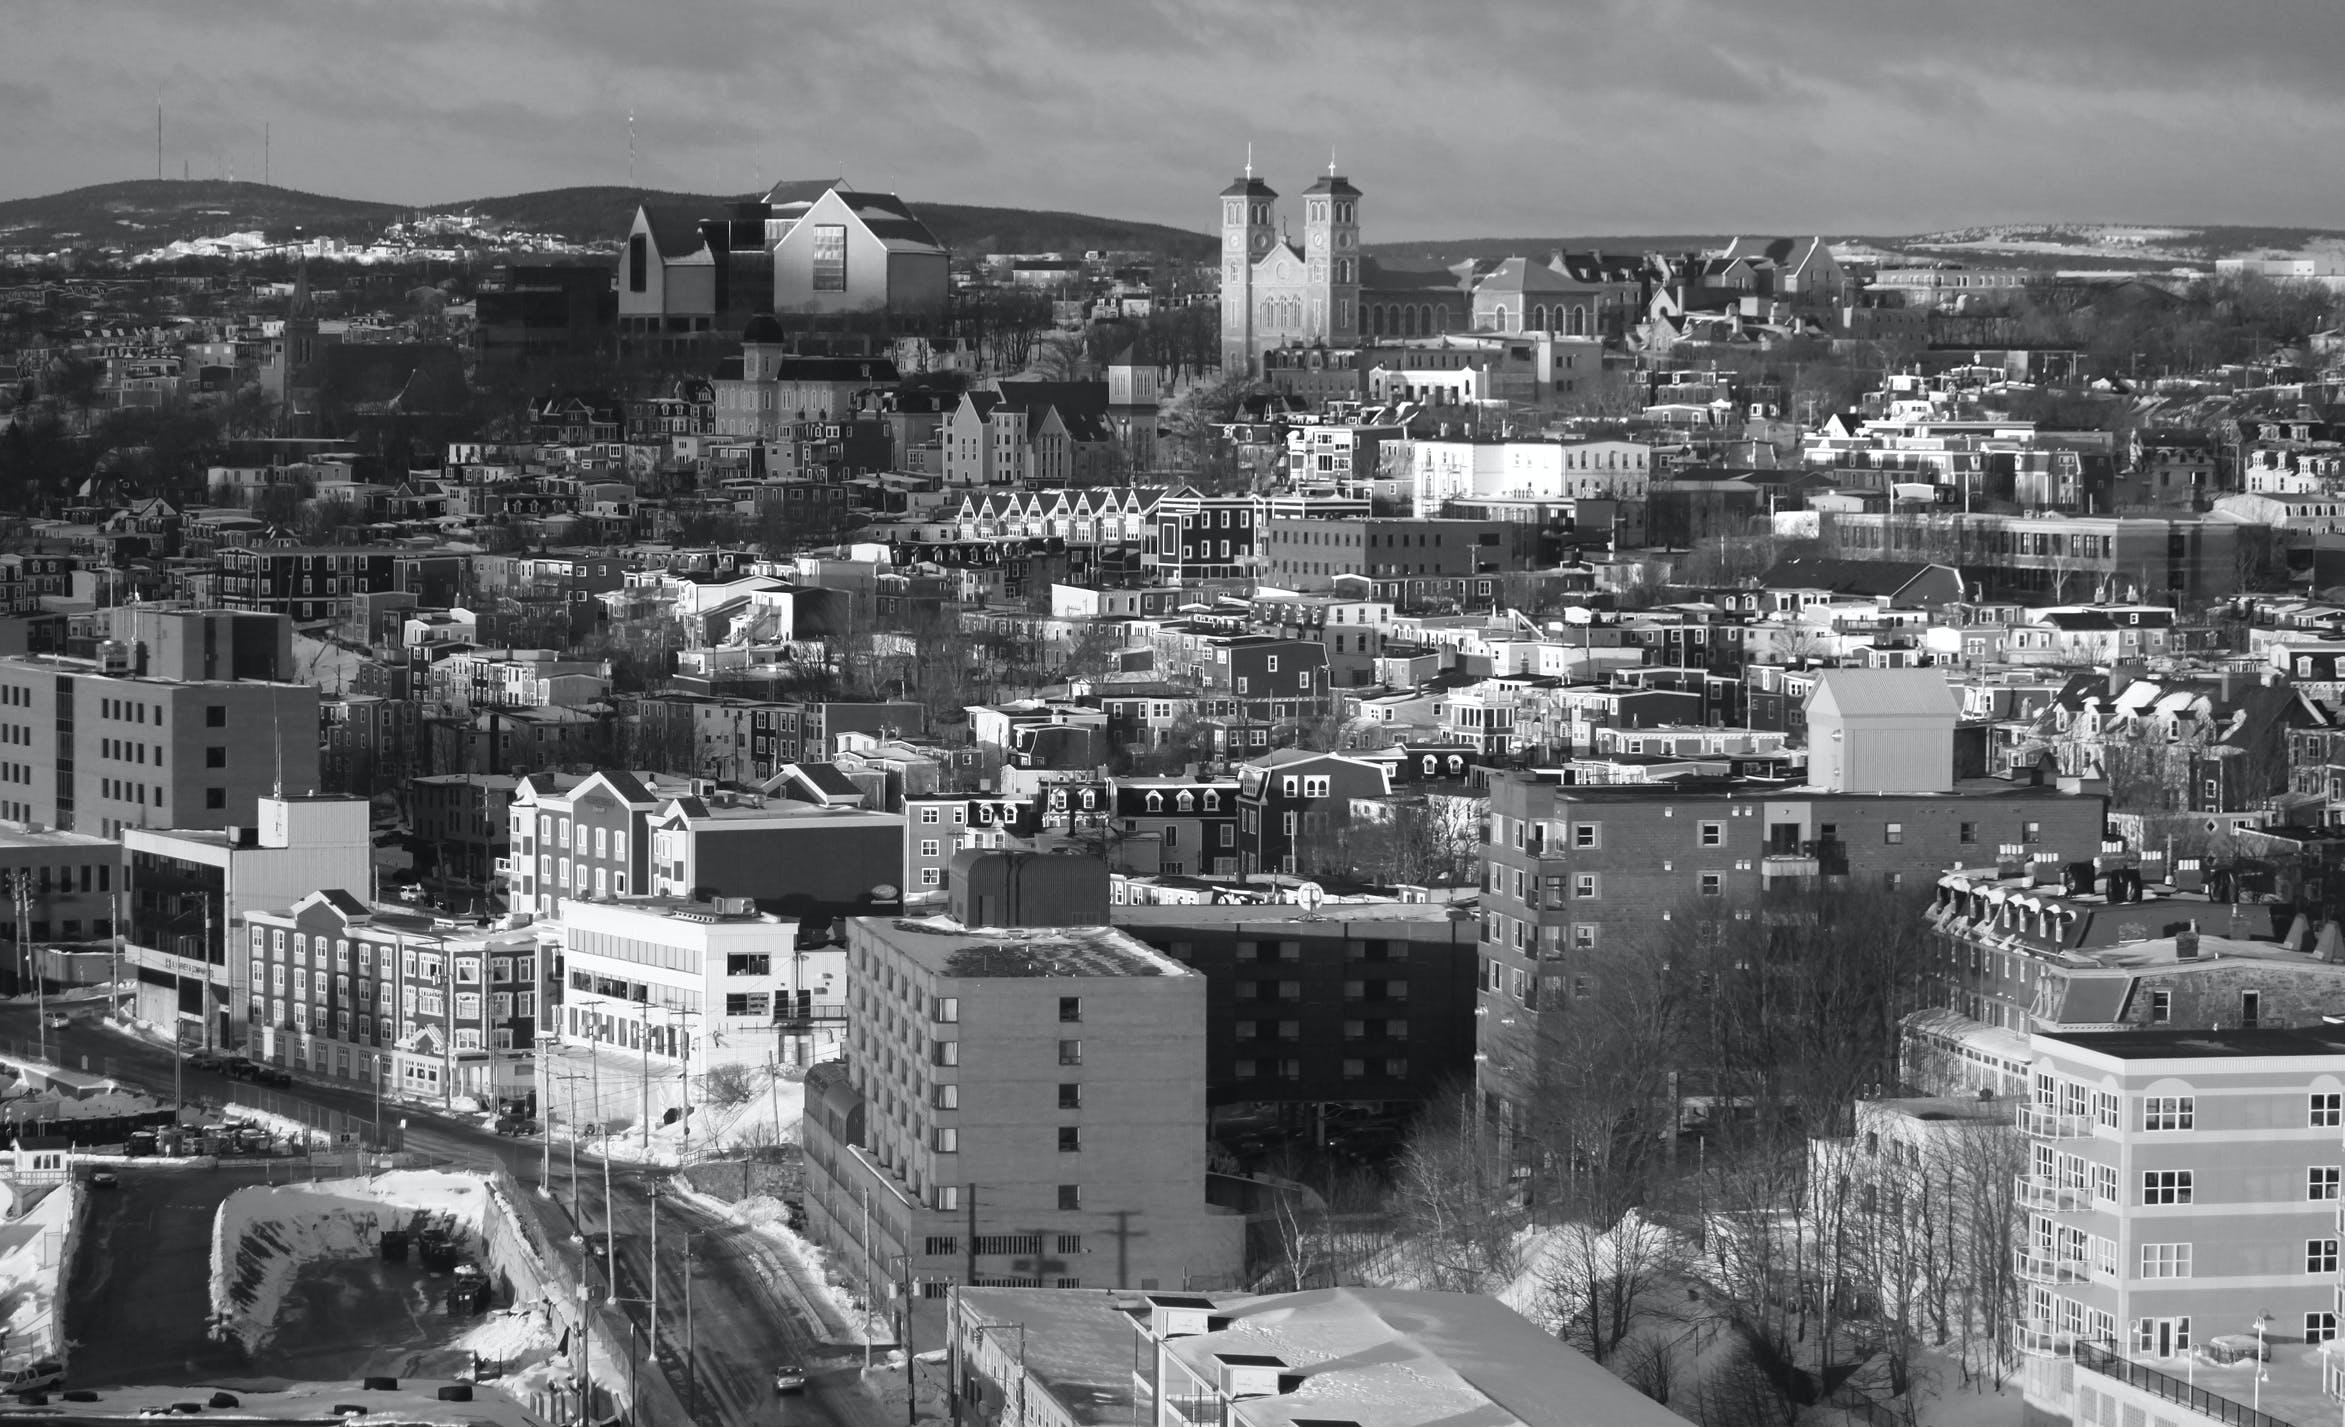 Grayscale Photo of Urban City